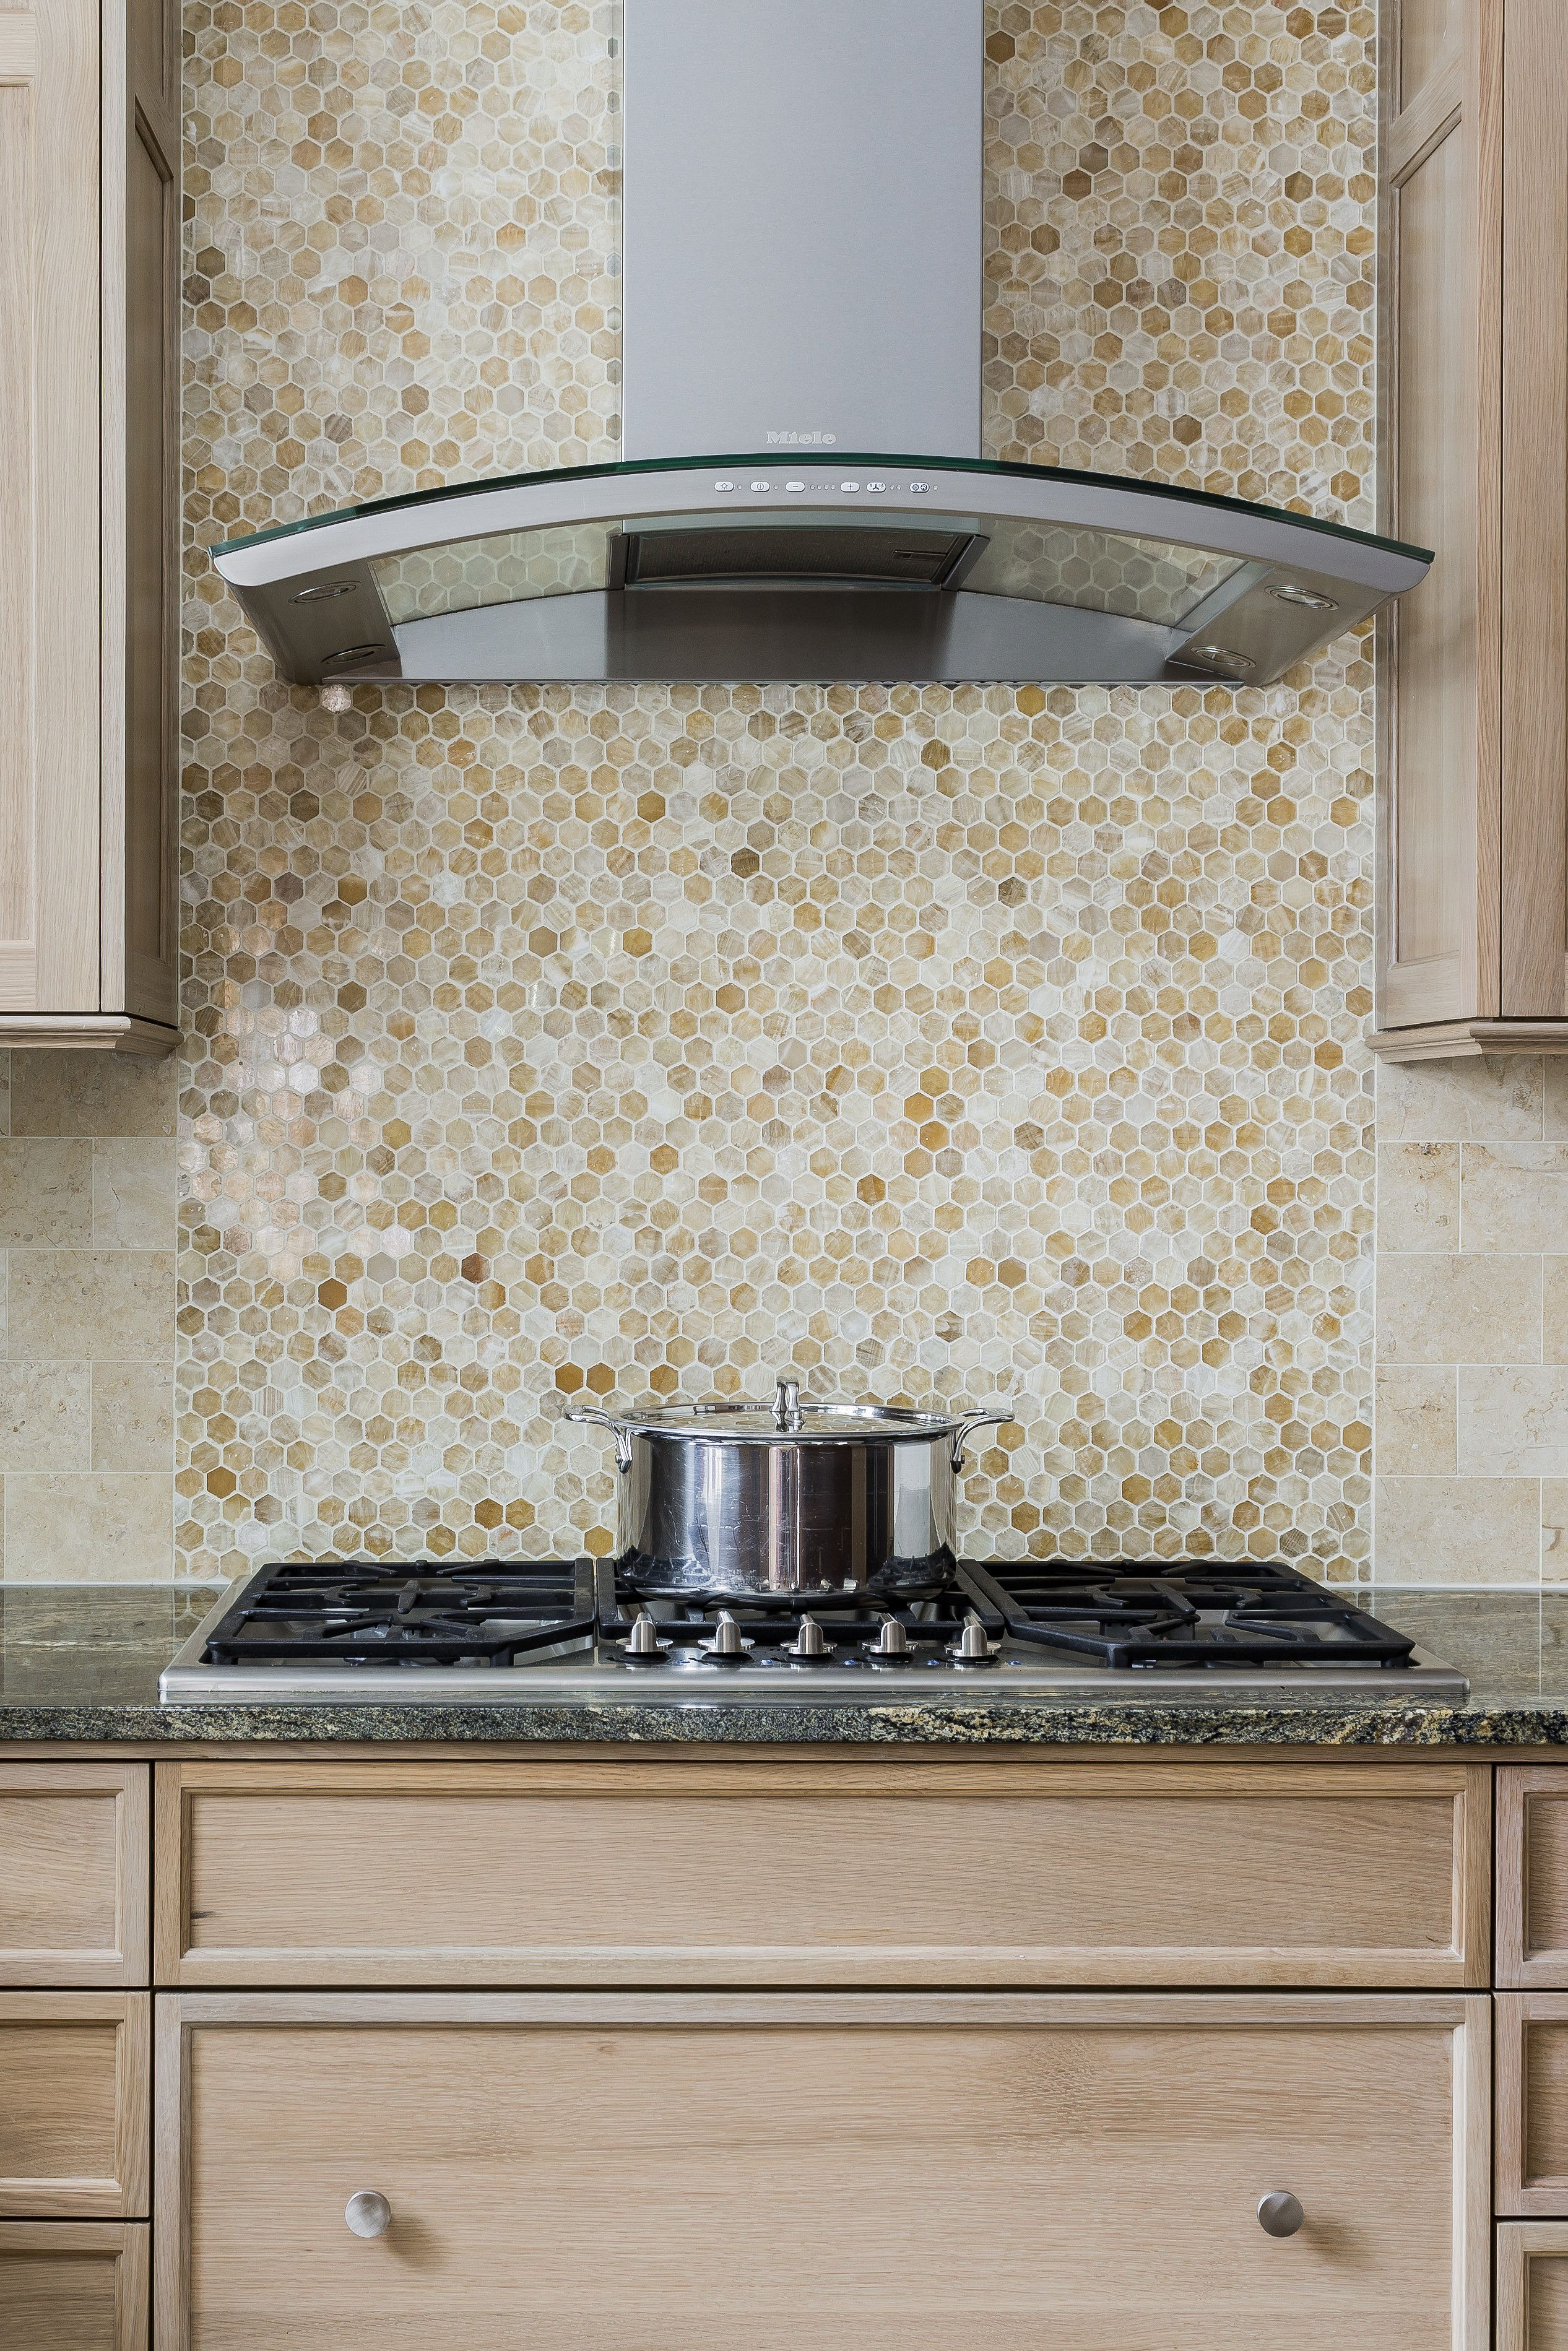 Honey Onyx Honeycomb Mosaic Behind The Range Hood This Wilson Kelsey Design Kitchen Project In The Boston Area Kitchen Backsplash Backsplash Slate Backsplash